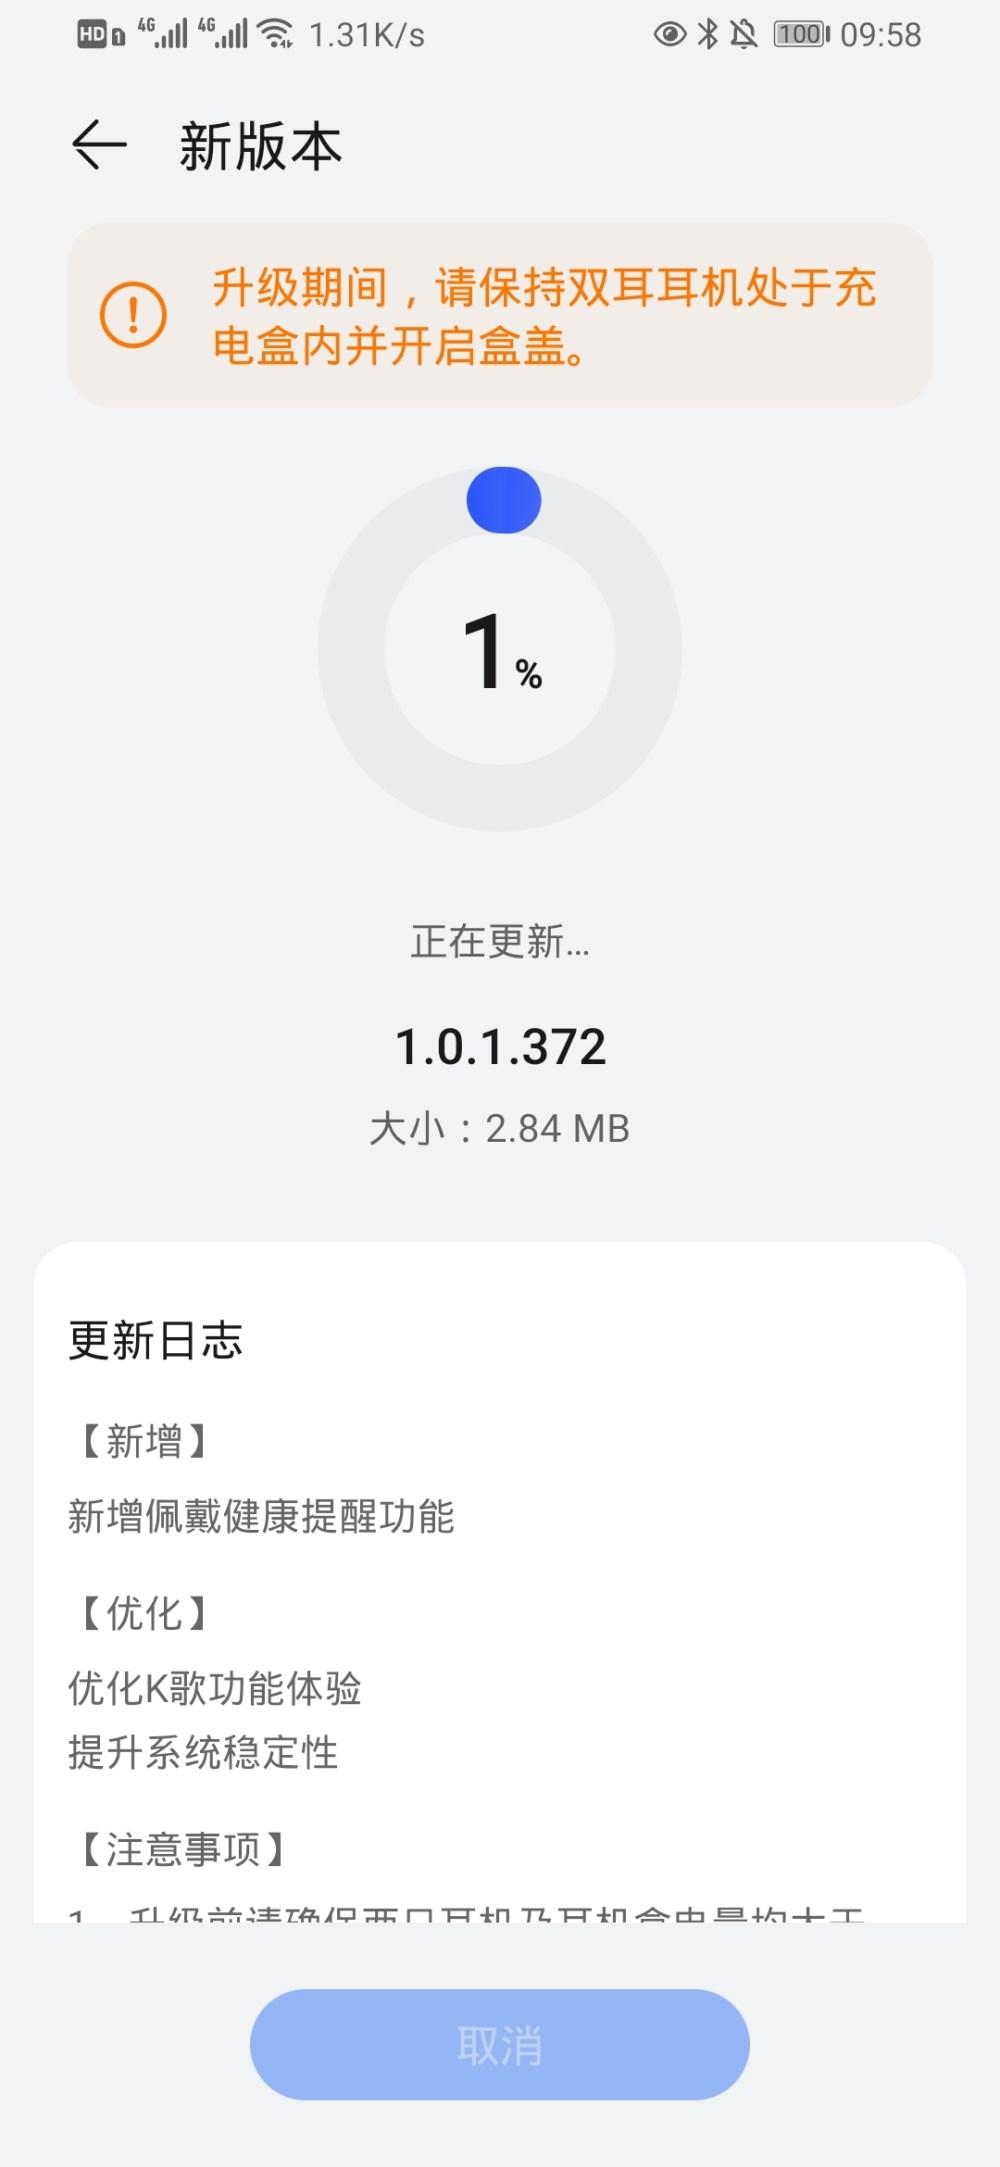 Huawei Freebuds Pro 1.0.1.372 update